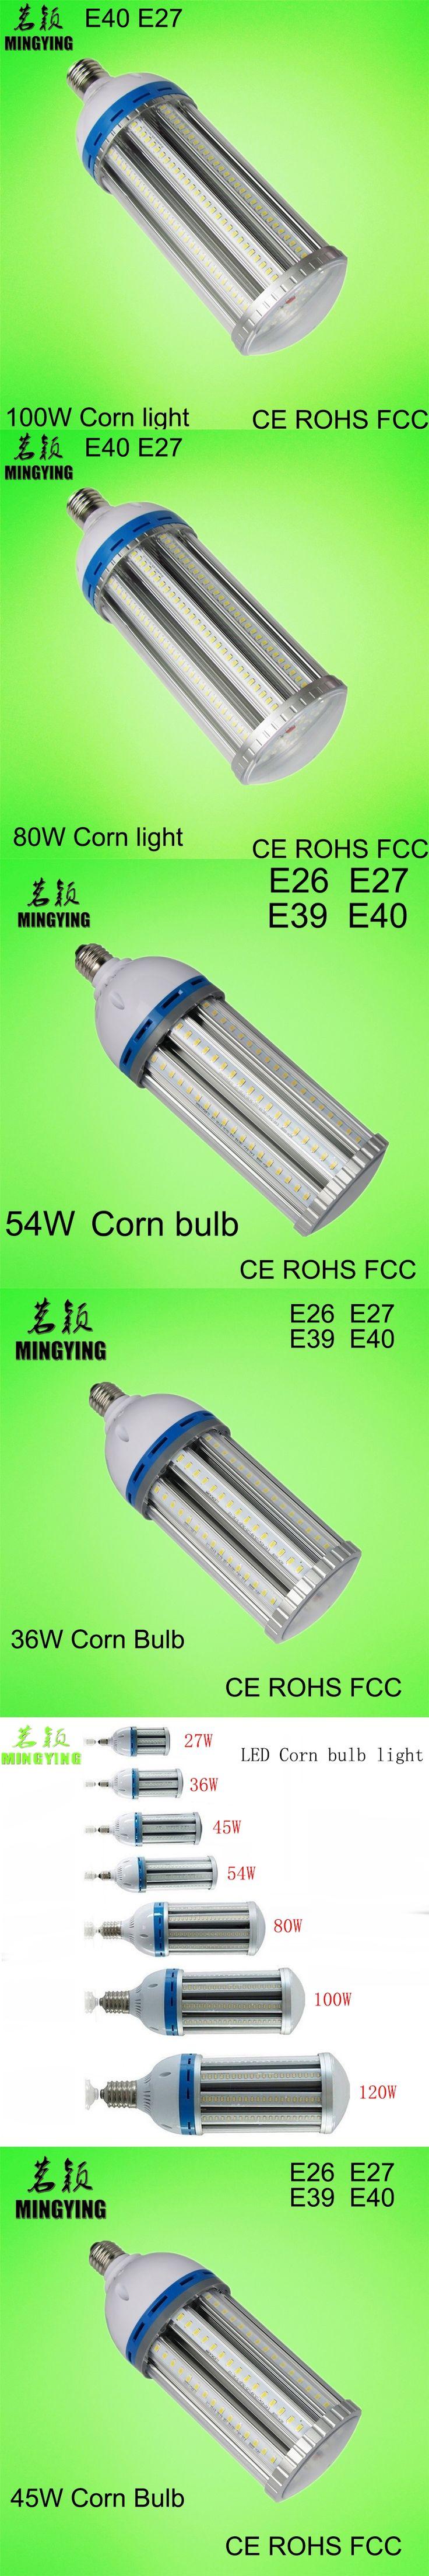 MINGYING LED Corn Bulb 36W 45W 54W 80W 100W 120W E26 E27 E39 E40 Factories Warehouse Parking Lot lighting street lamp CE EMC FCC